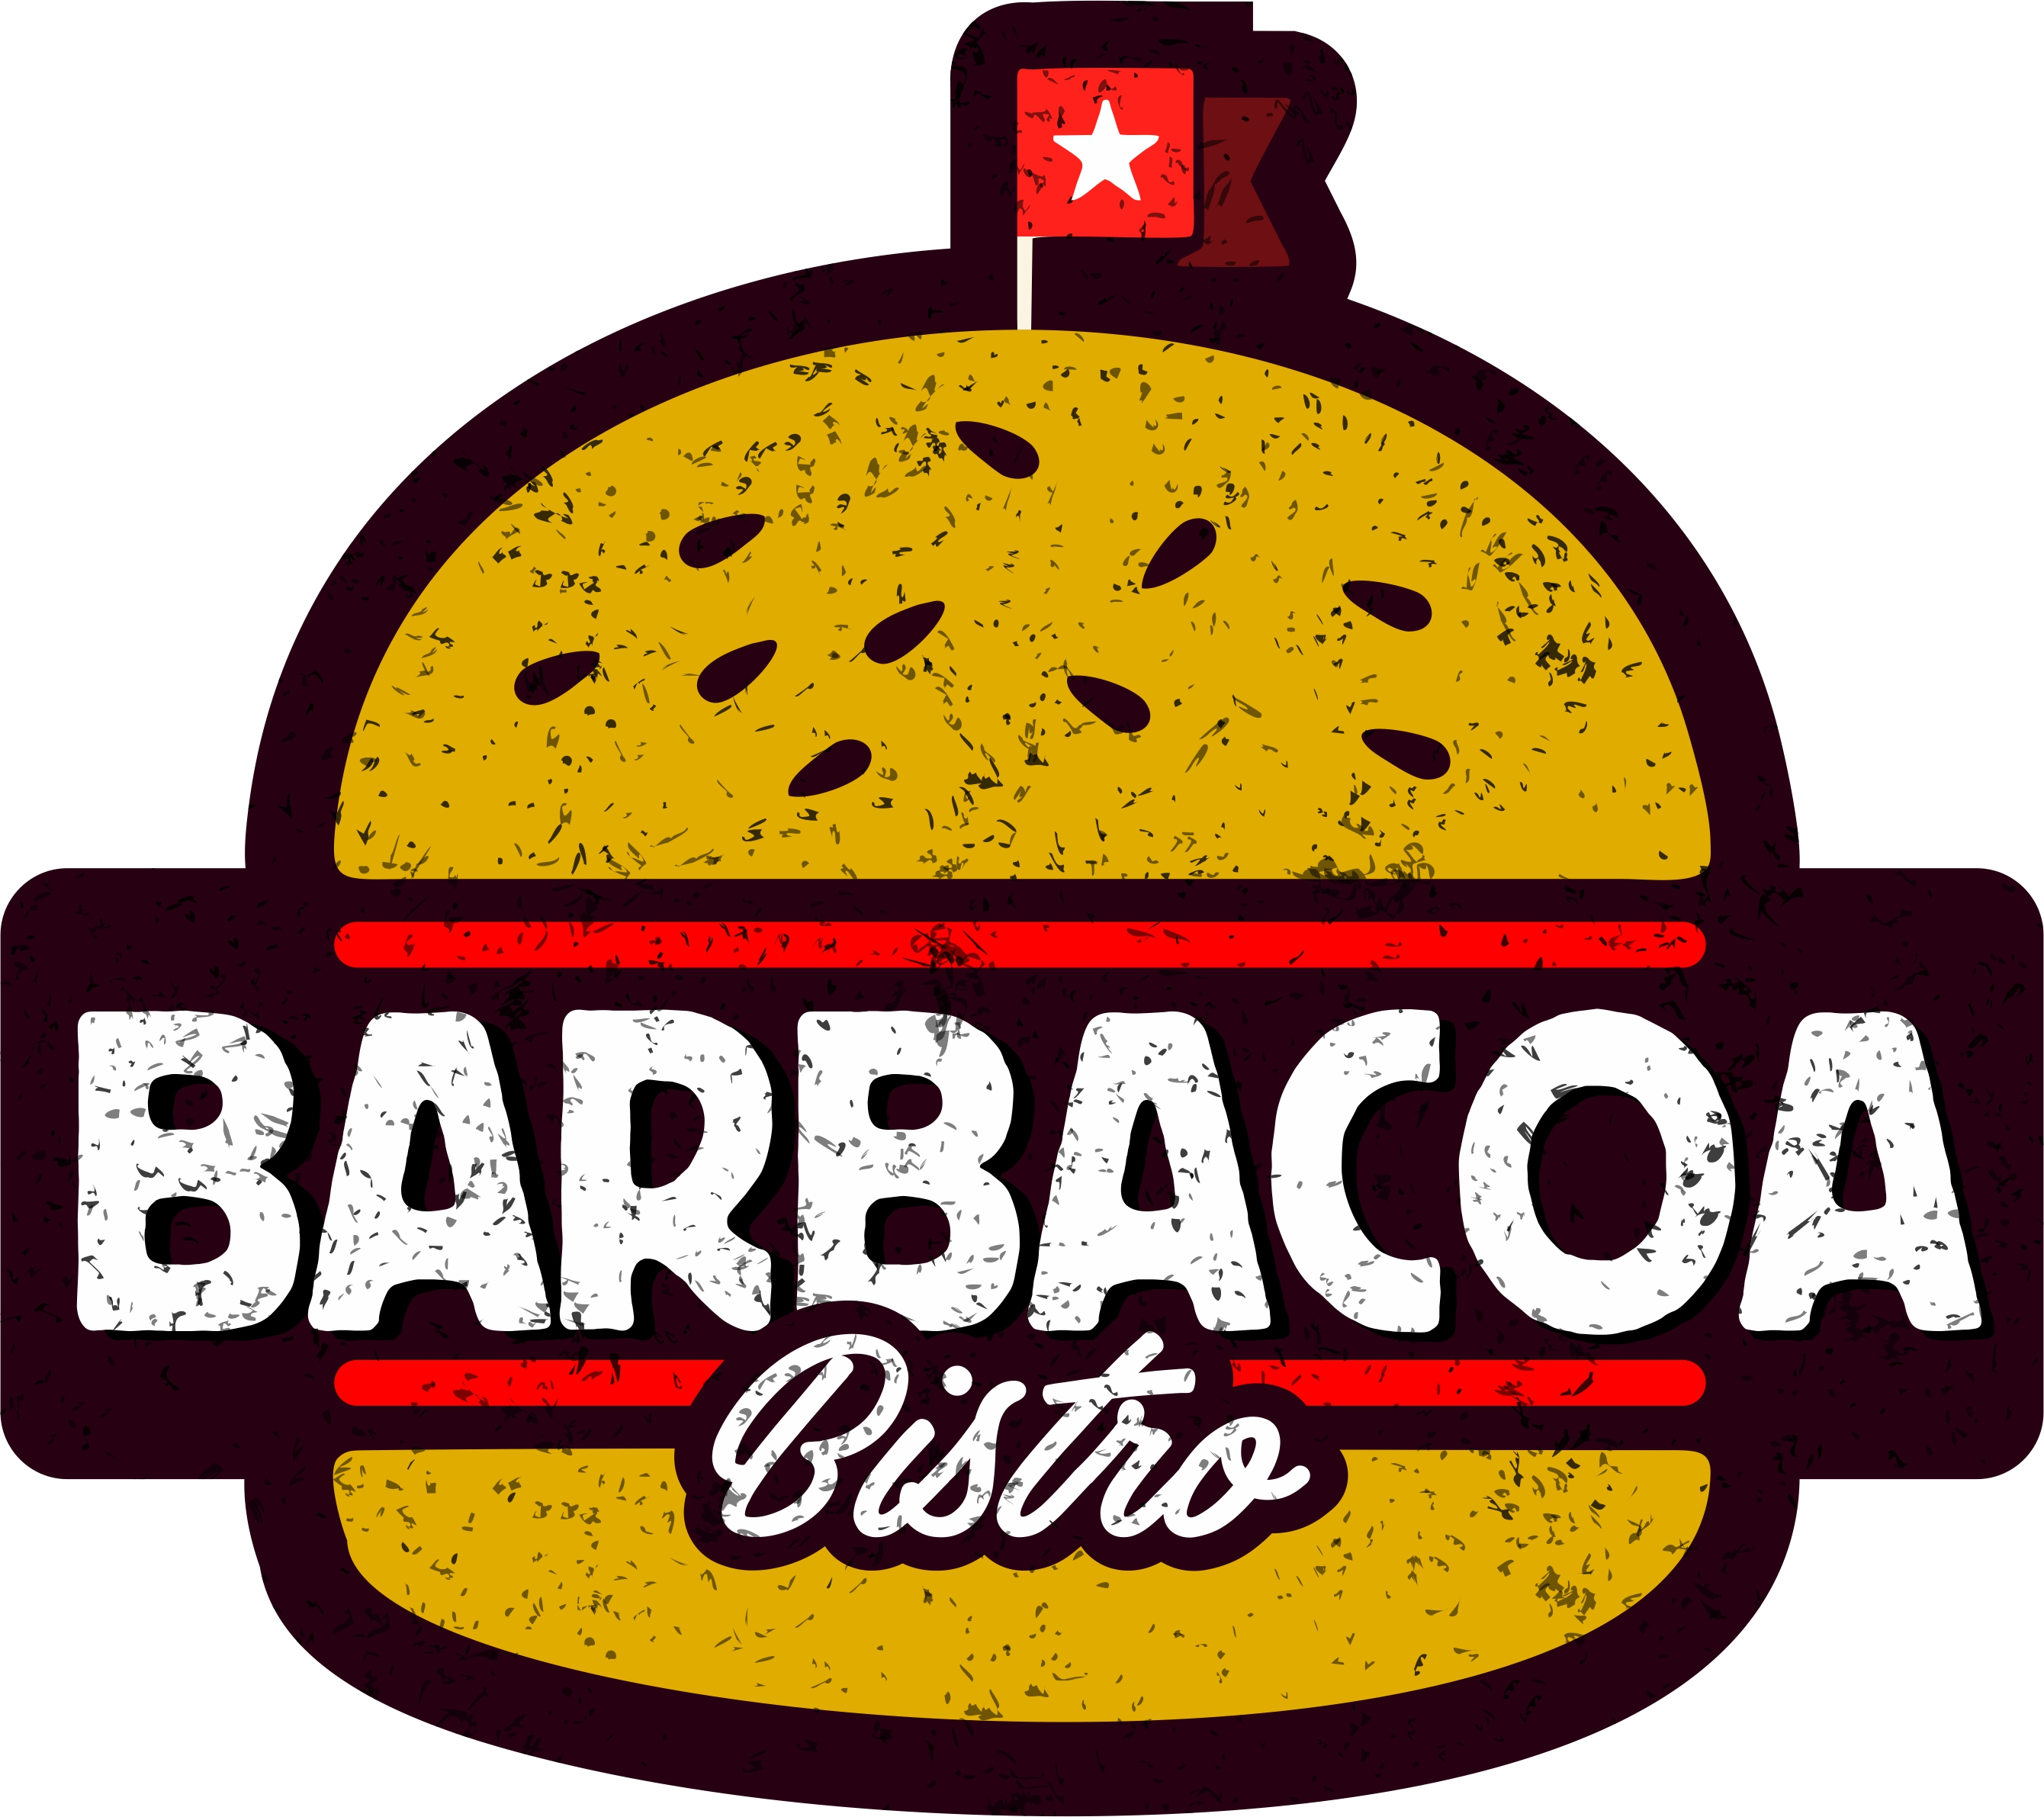 Barbacoa Bistro